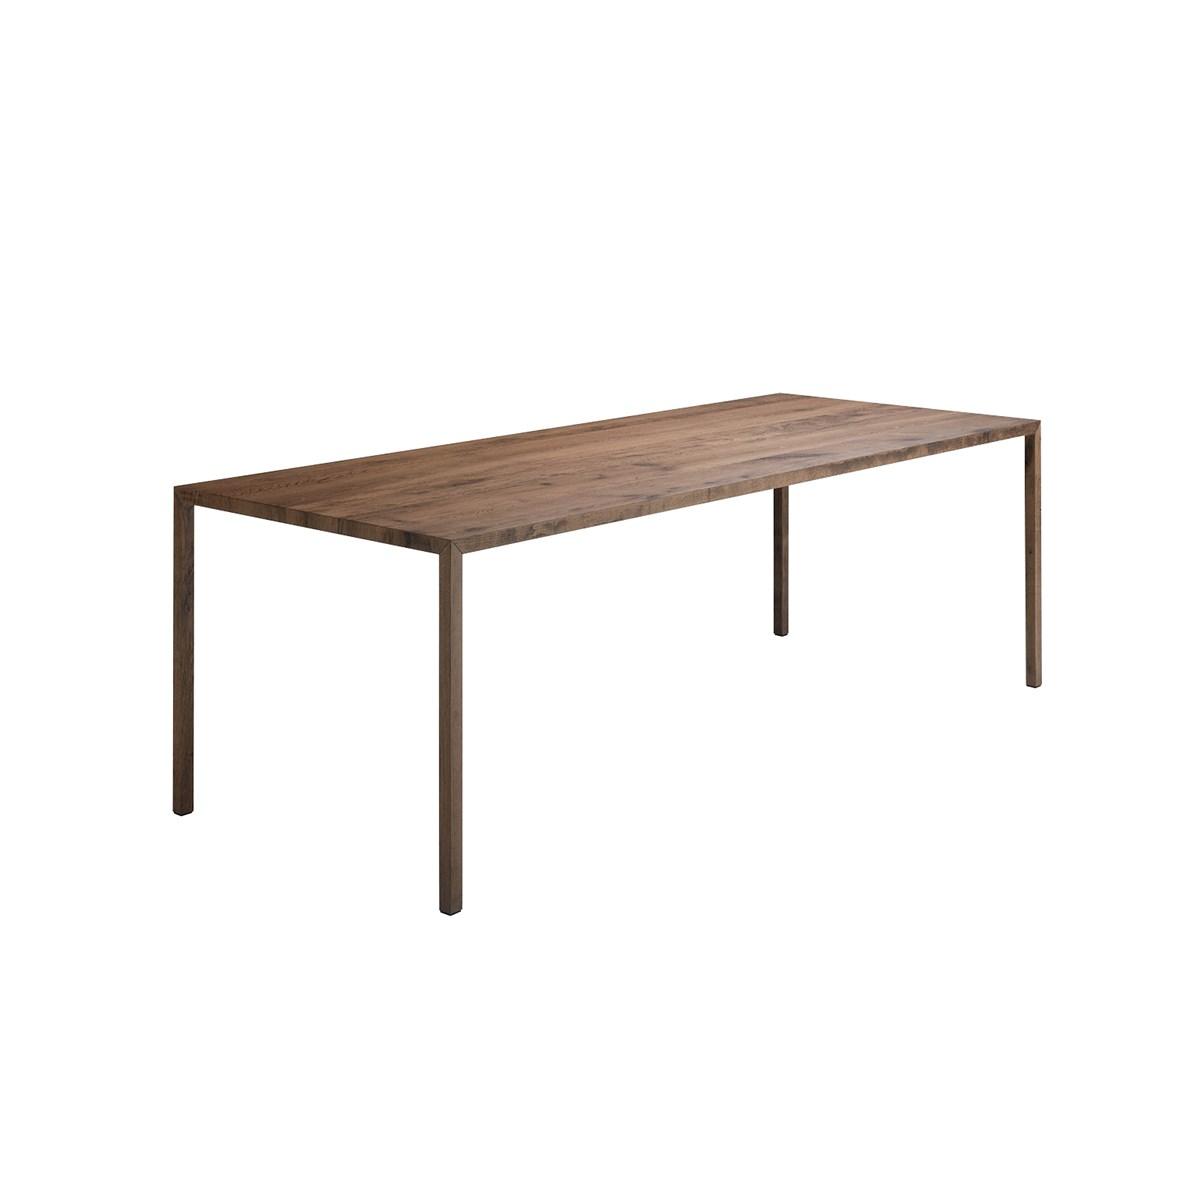 MDF-Italia-Piergiorgio-Cazzaniga-Tense-Table-Matisse-1 (1)